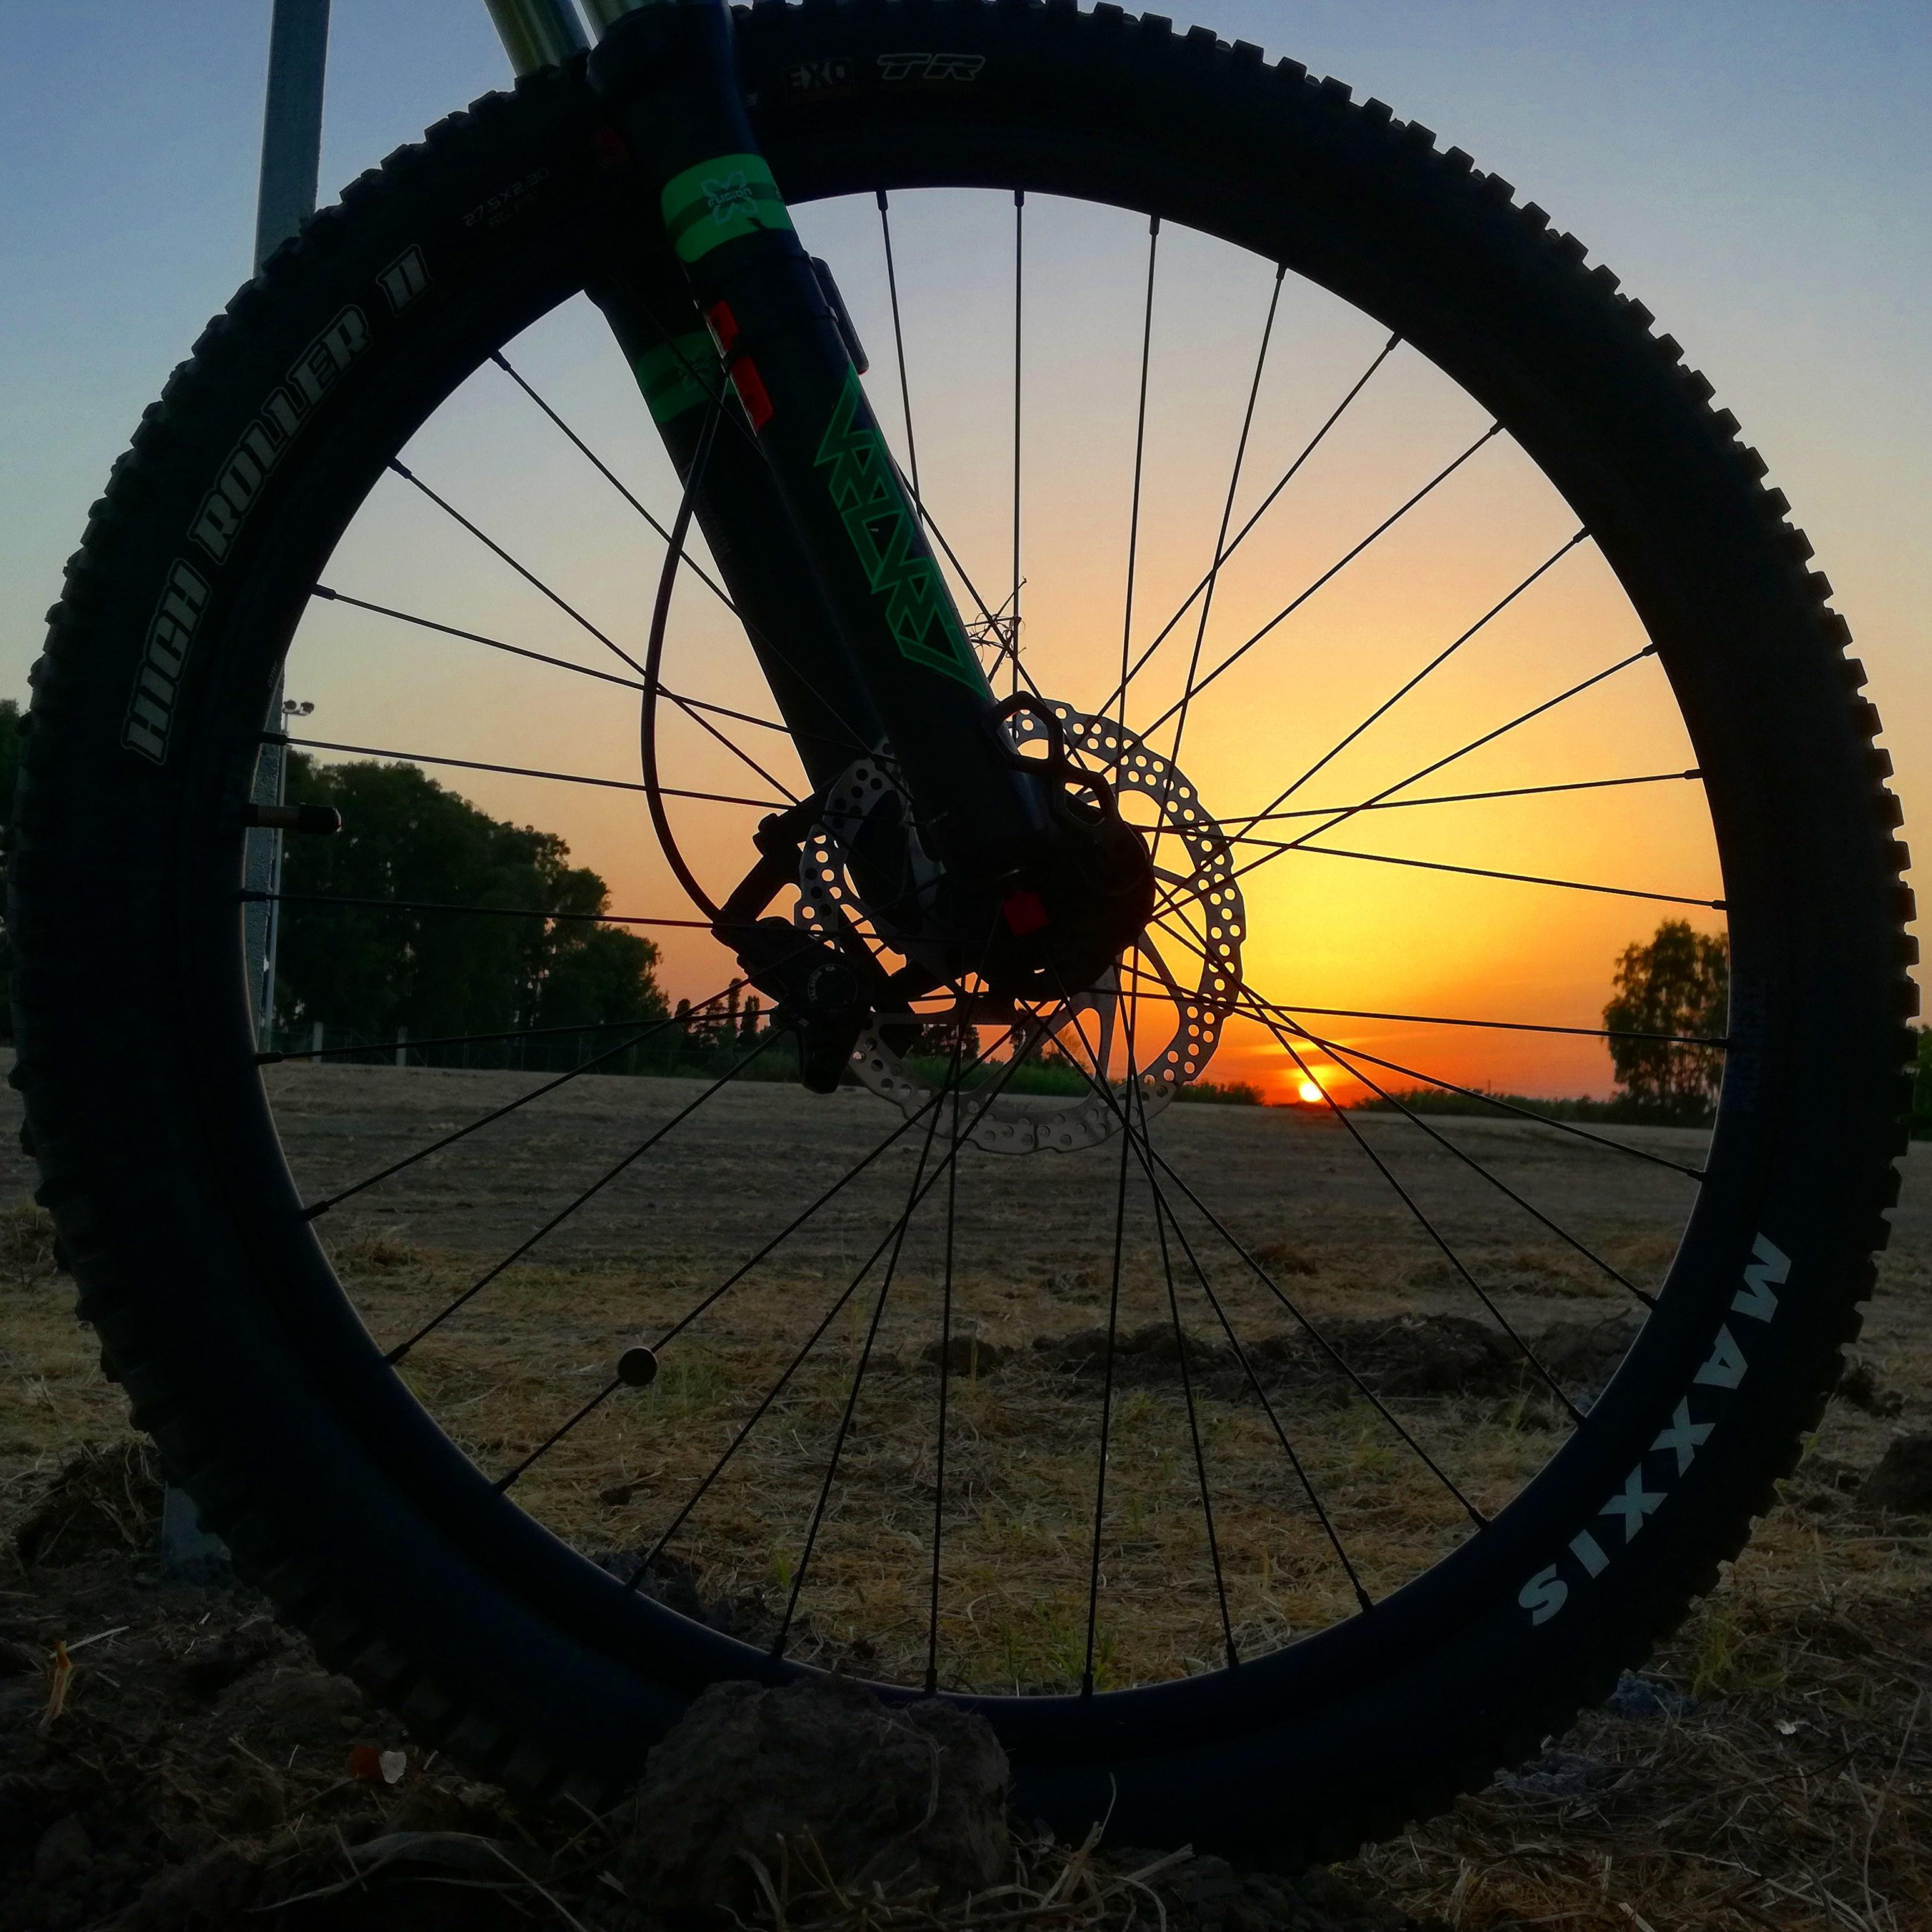 MTB sardabike sardegna oristano mountain bike tour guide guided trails sea sunset